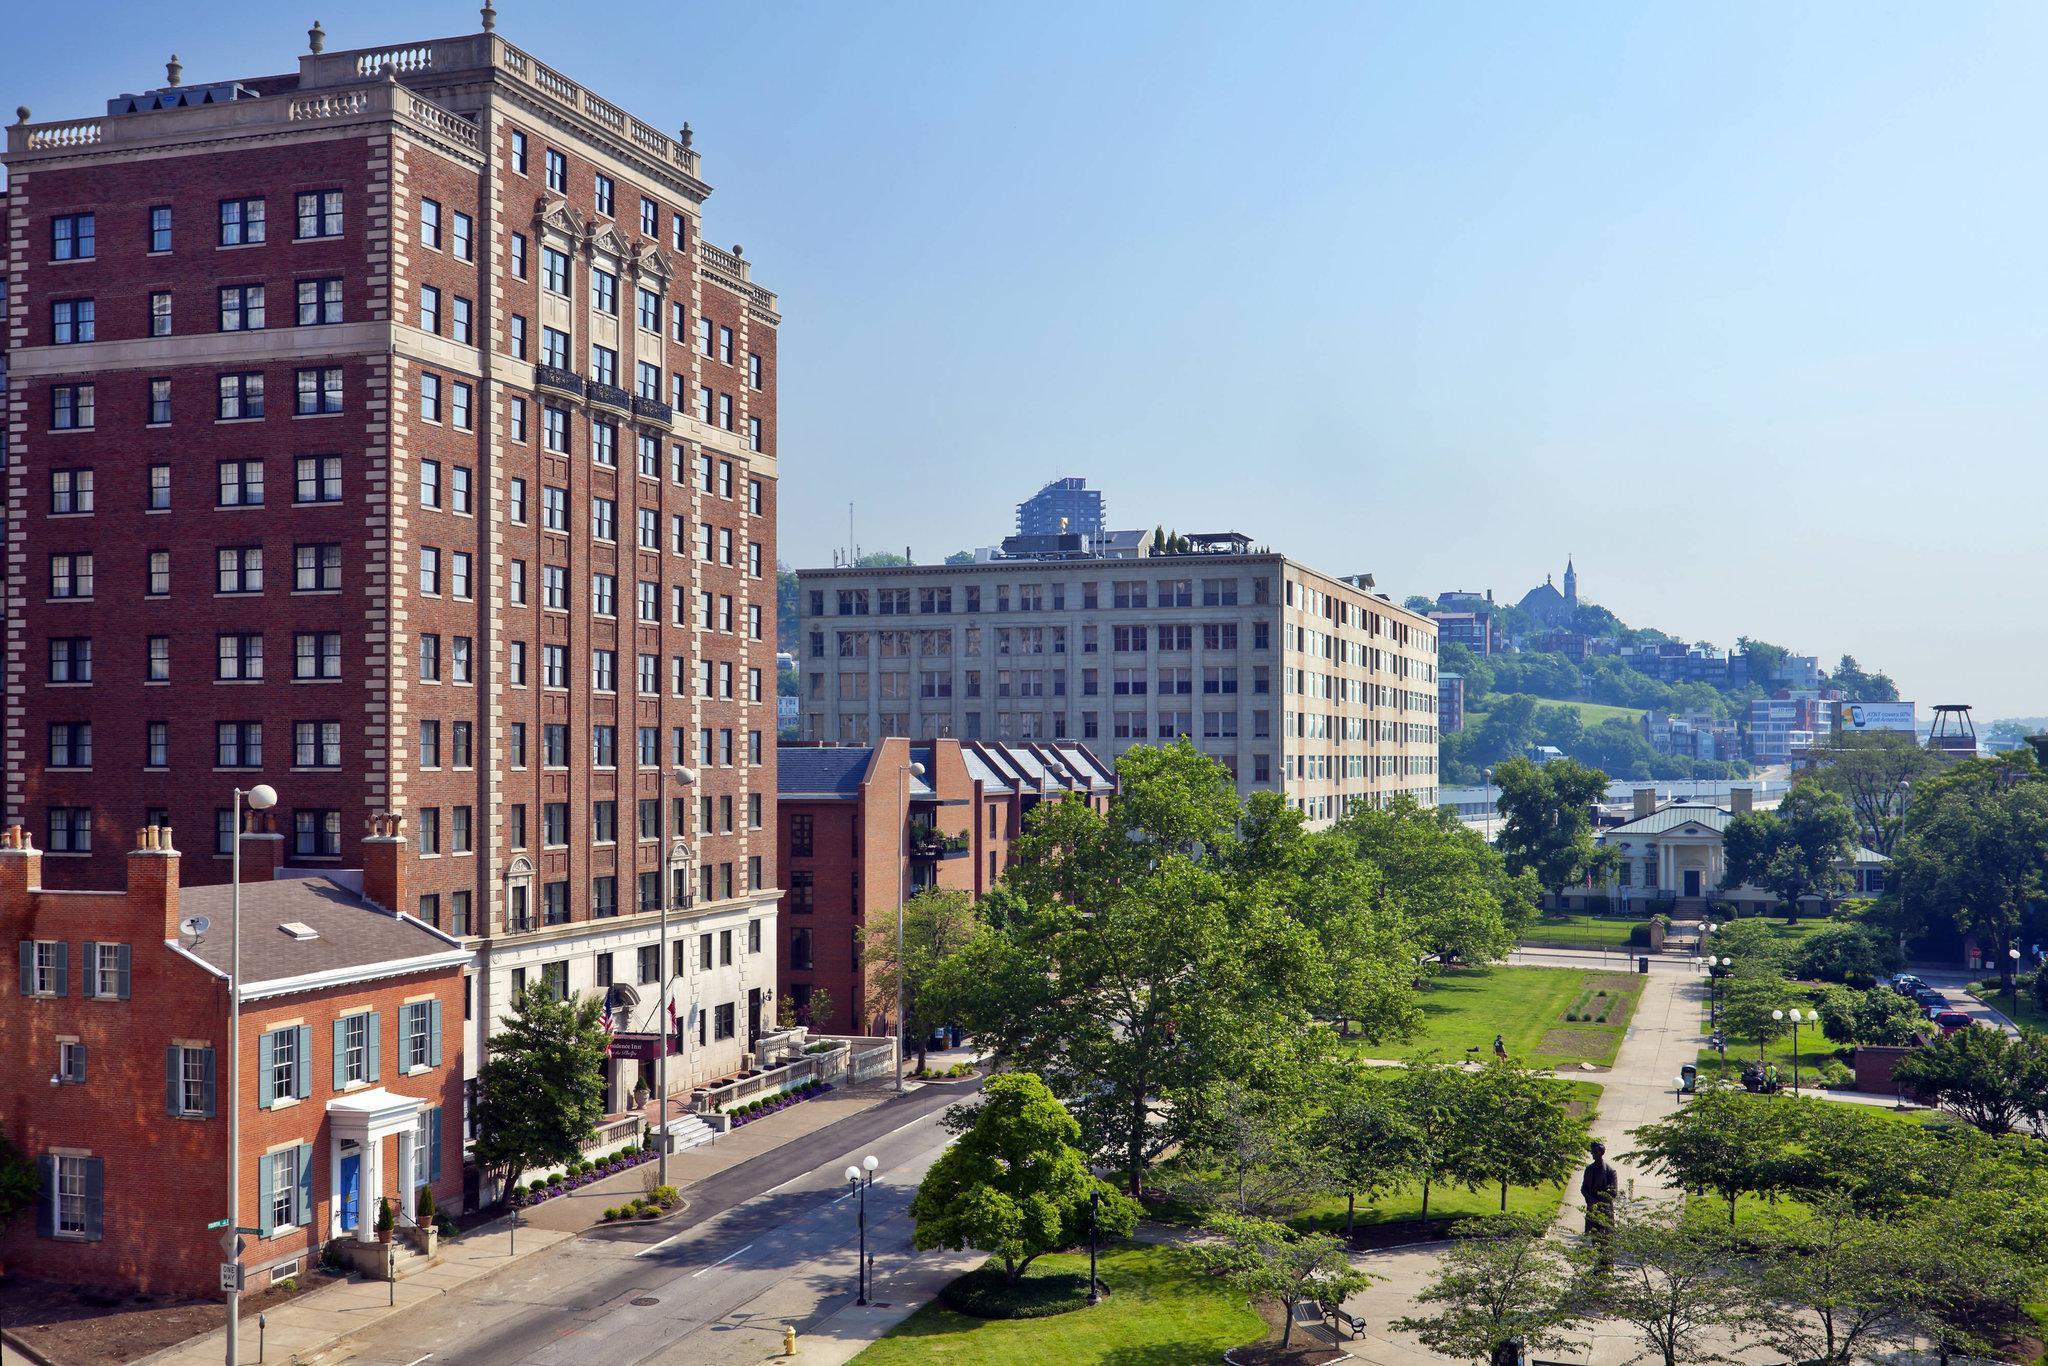 Residence Inn Cincinnati Downtown The Phelps